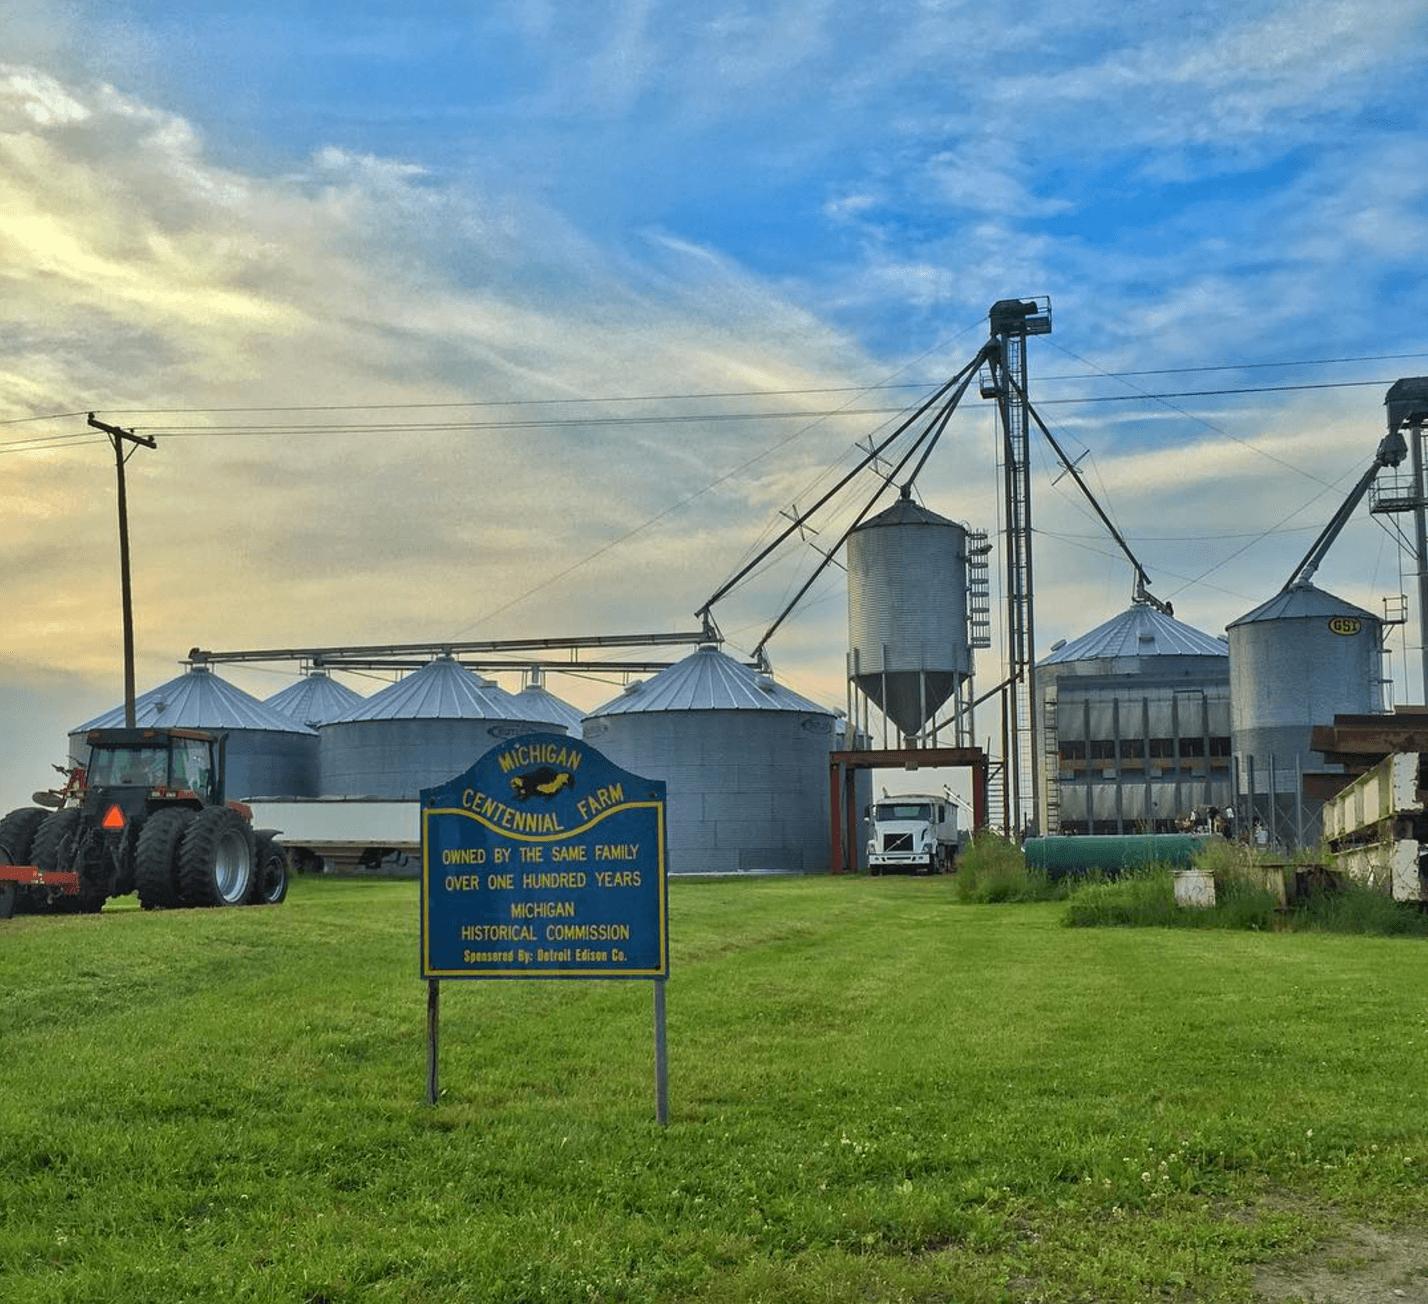 Michigan Centennial Farm